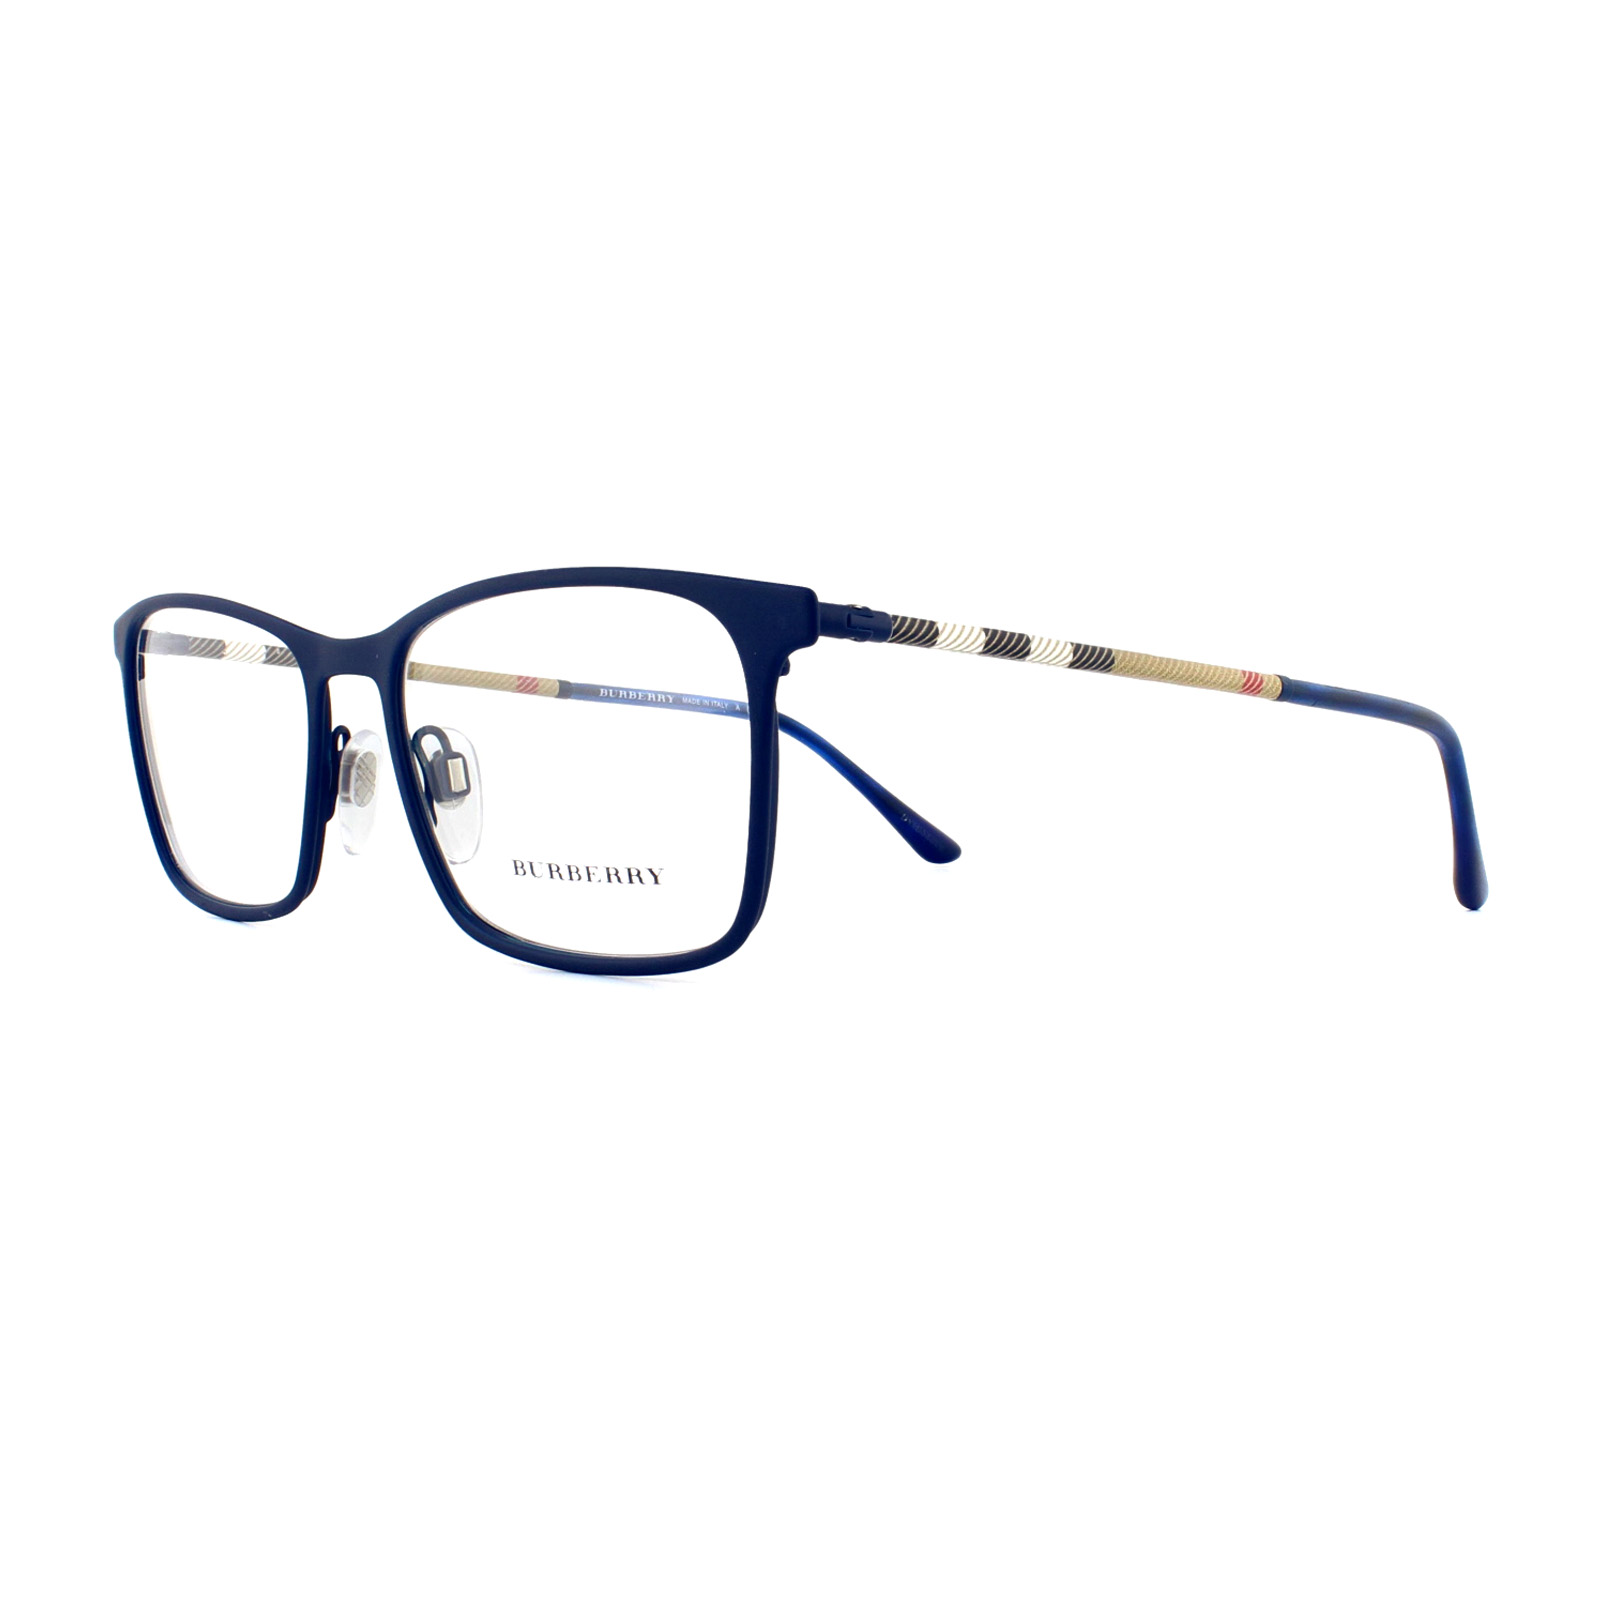 ec6c6bf7164d Sentinel Burberry Glasses Frames BE 1309Q 1224 Blue Rubber 54mm Mens